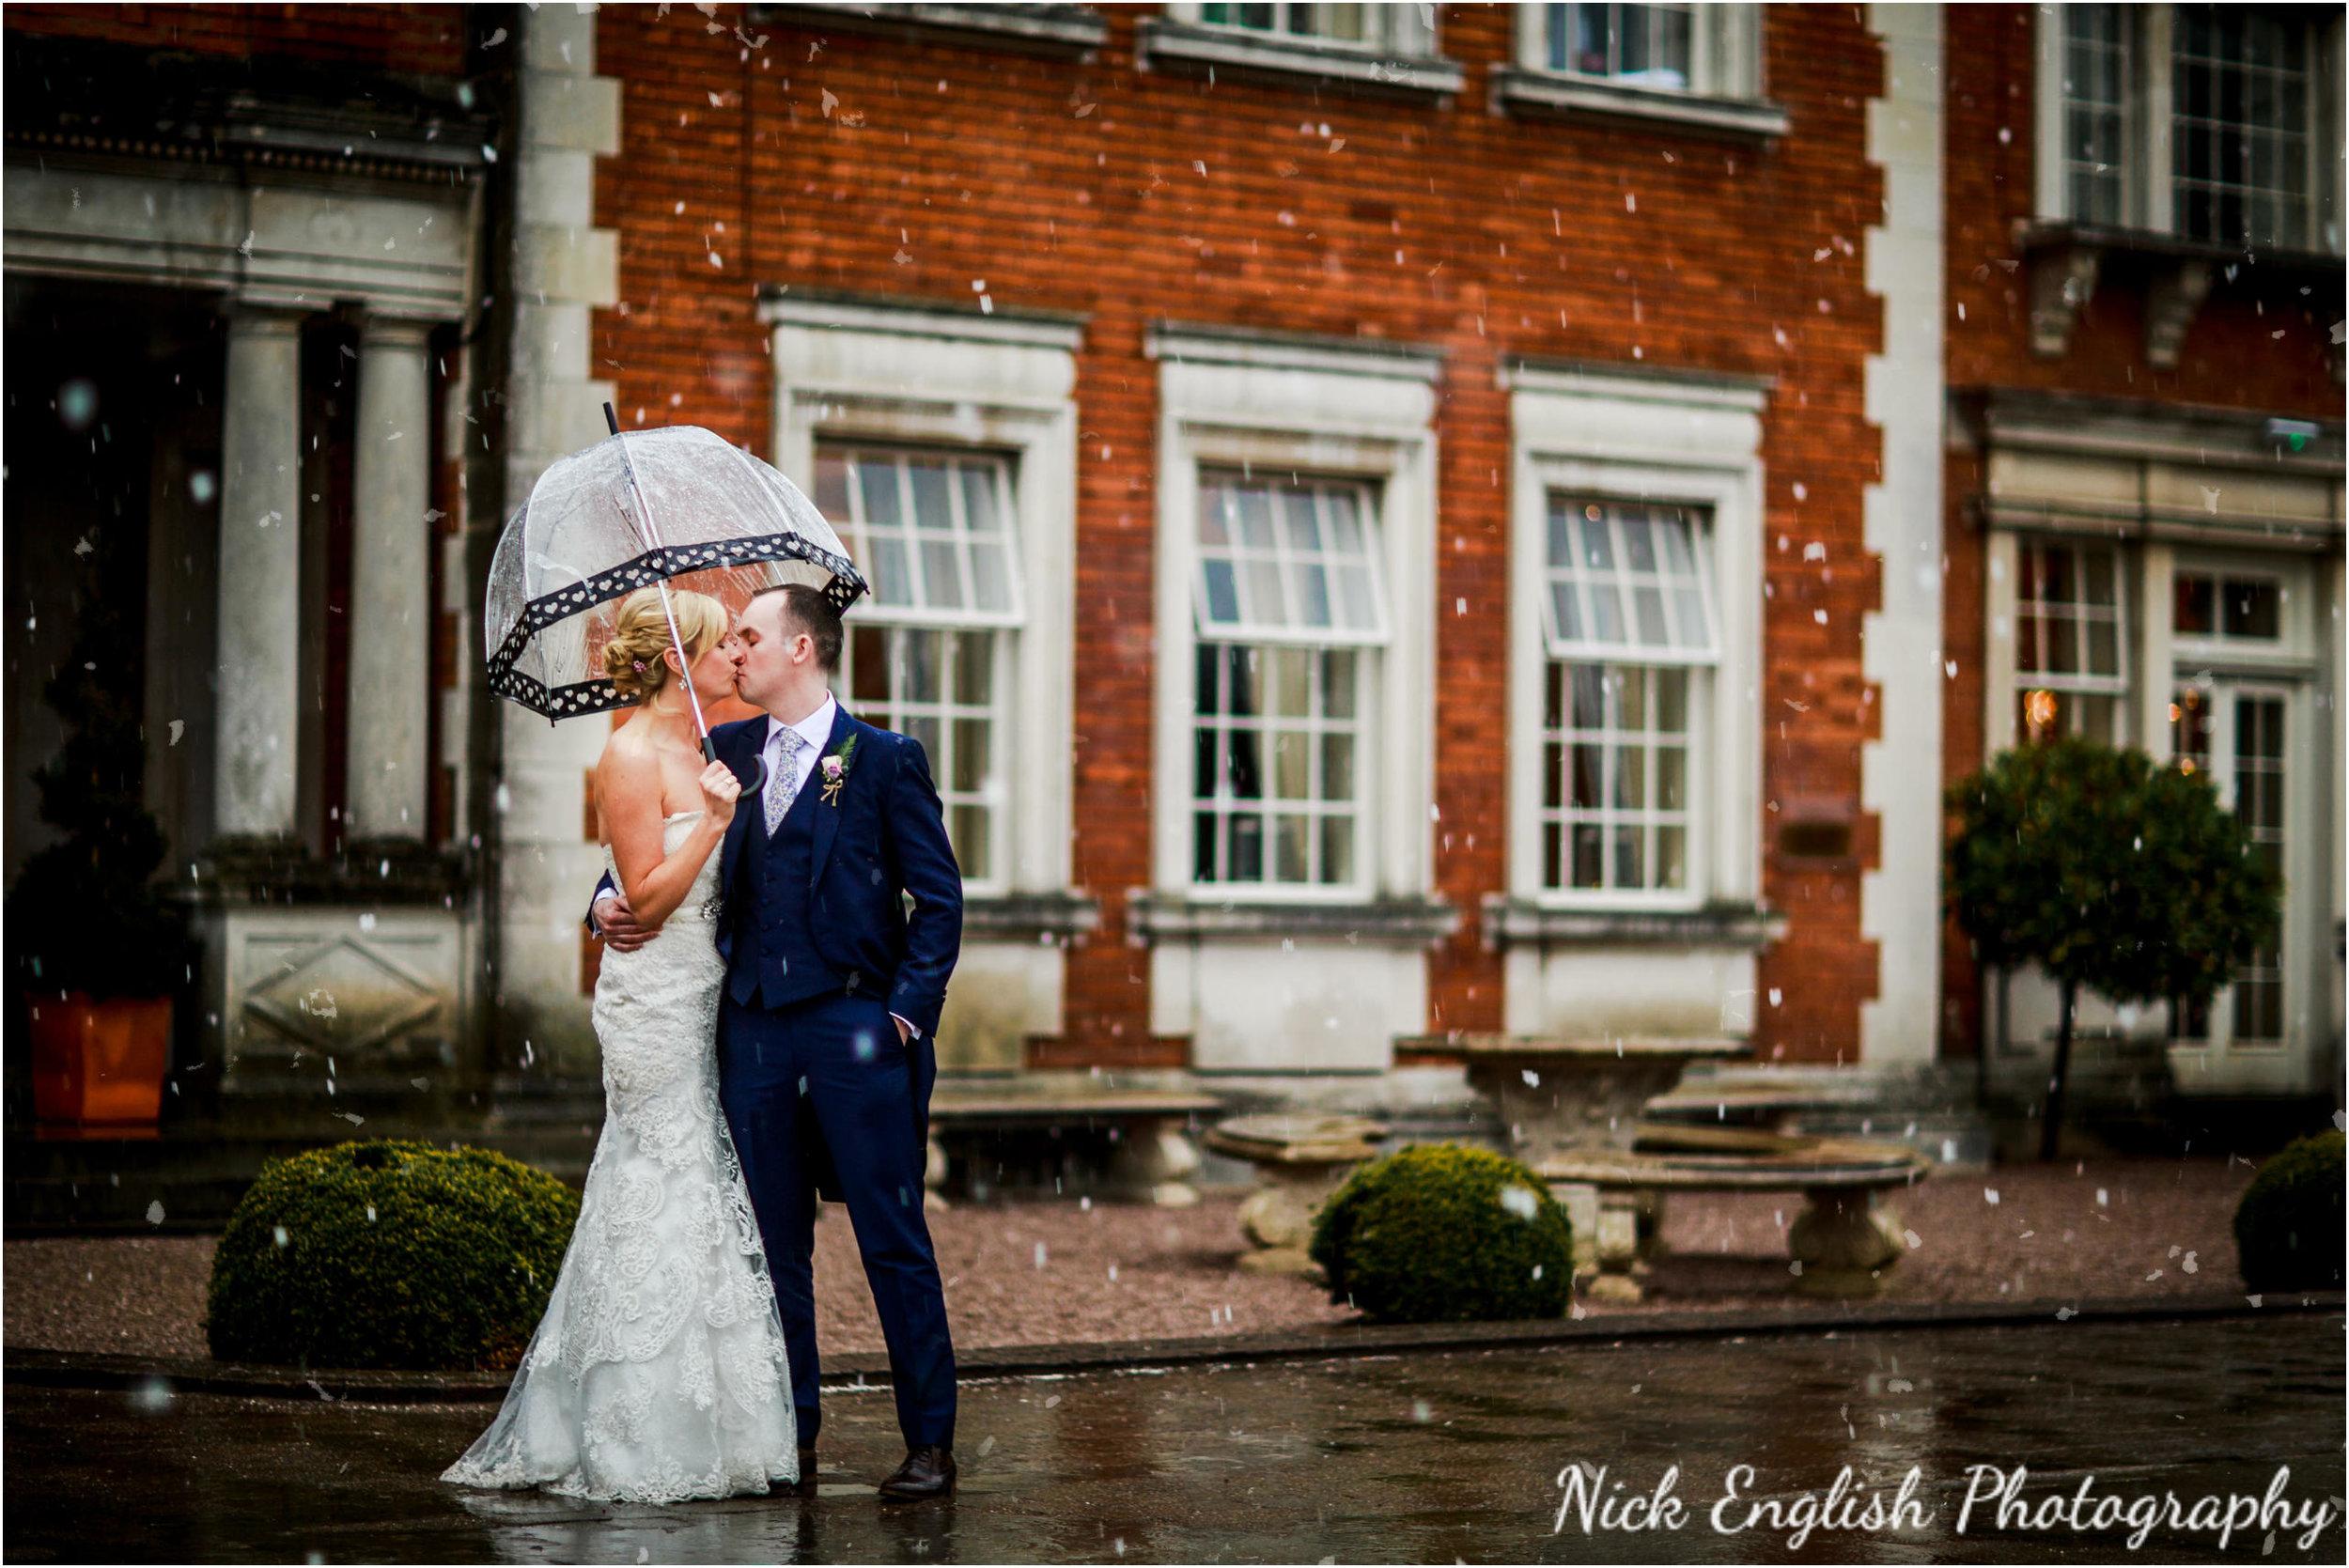 Eaves Hall Wedding Photoghraphy in the snow!